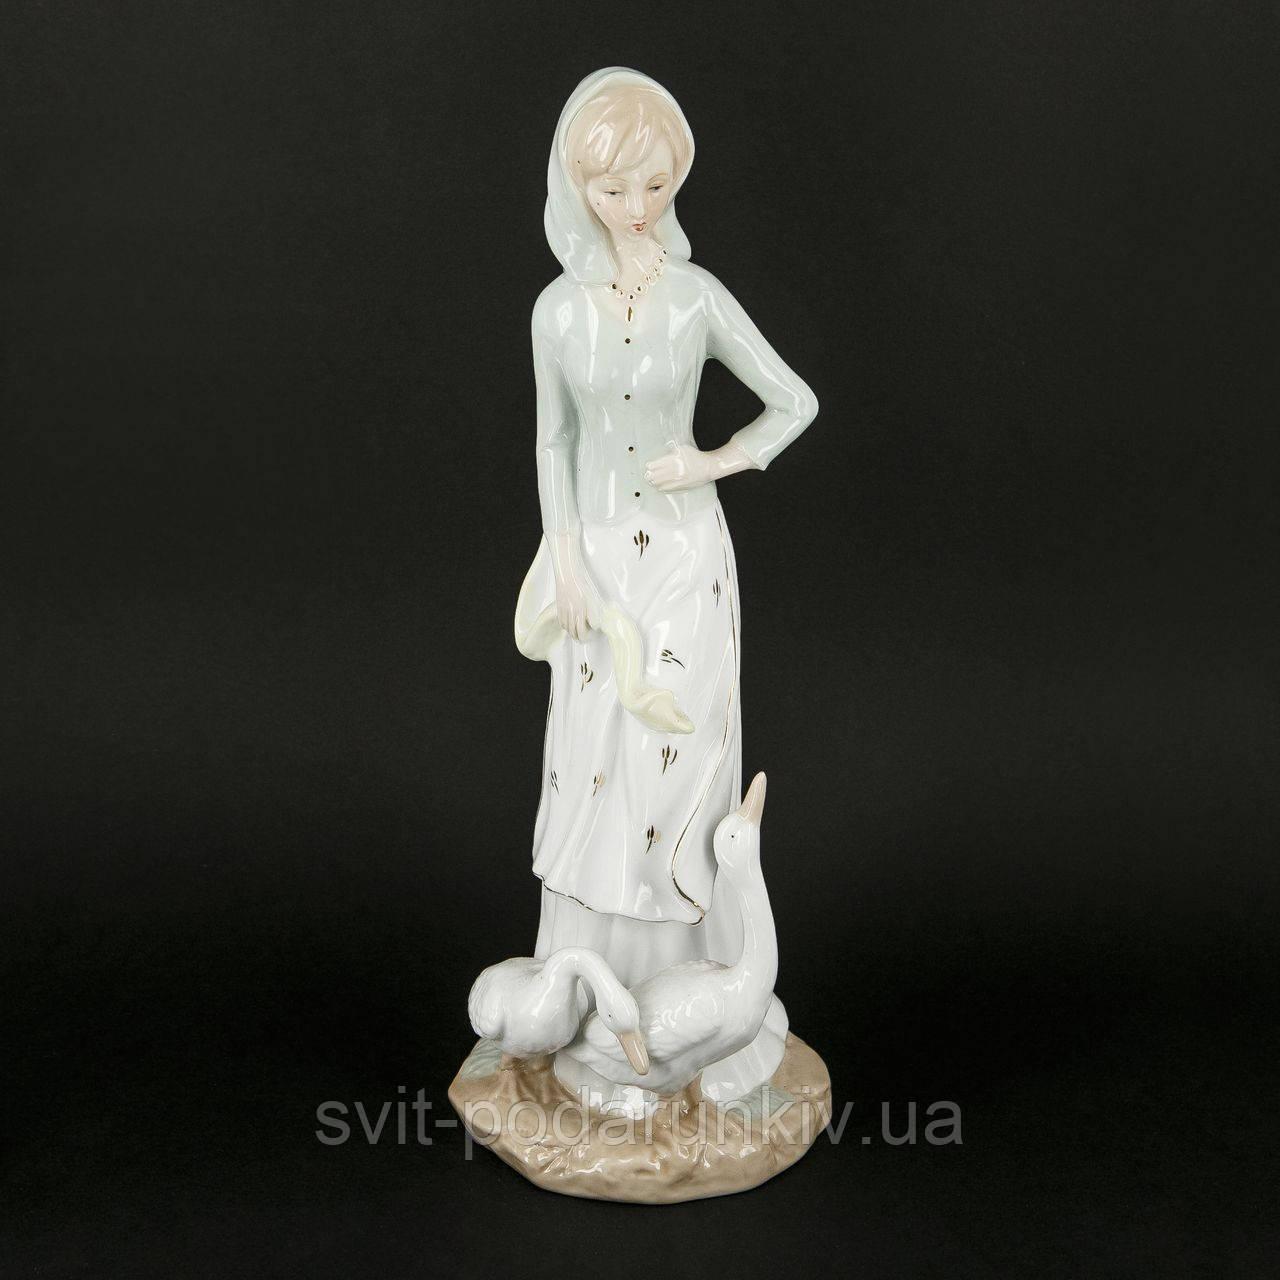 статуэтка девочки